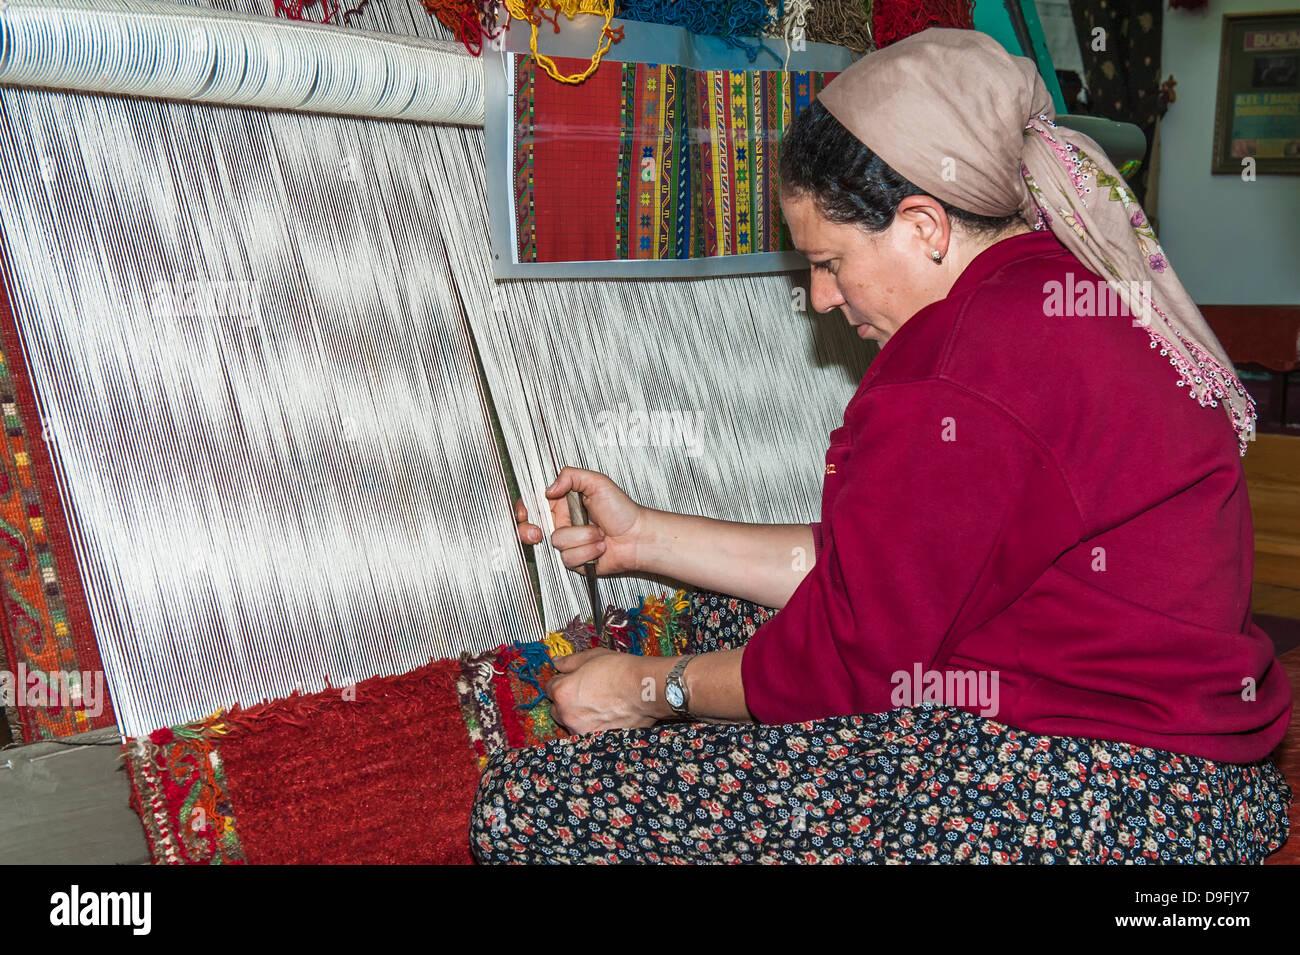 Woman weaving a carpet, Antalya, Anatolia, Turkey Minor, Eurasia - Stock Image